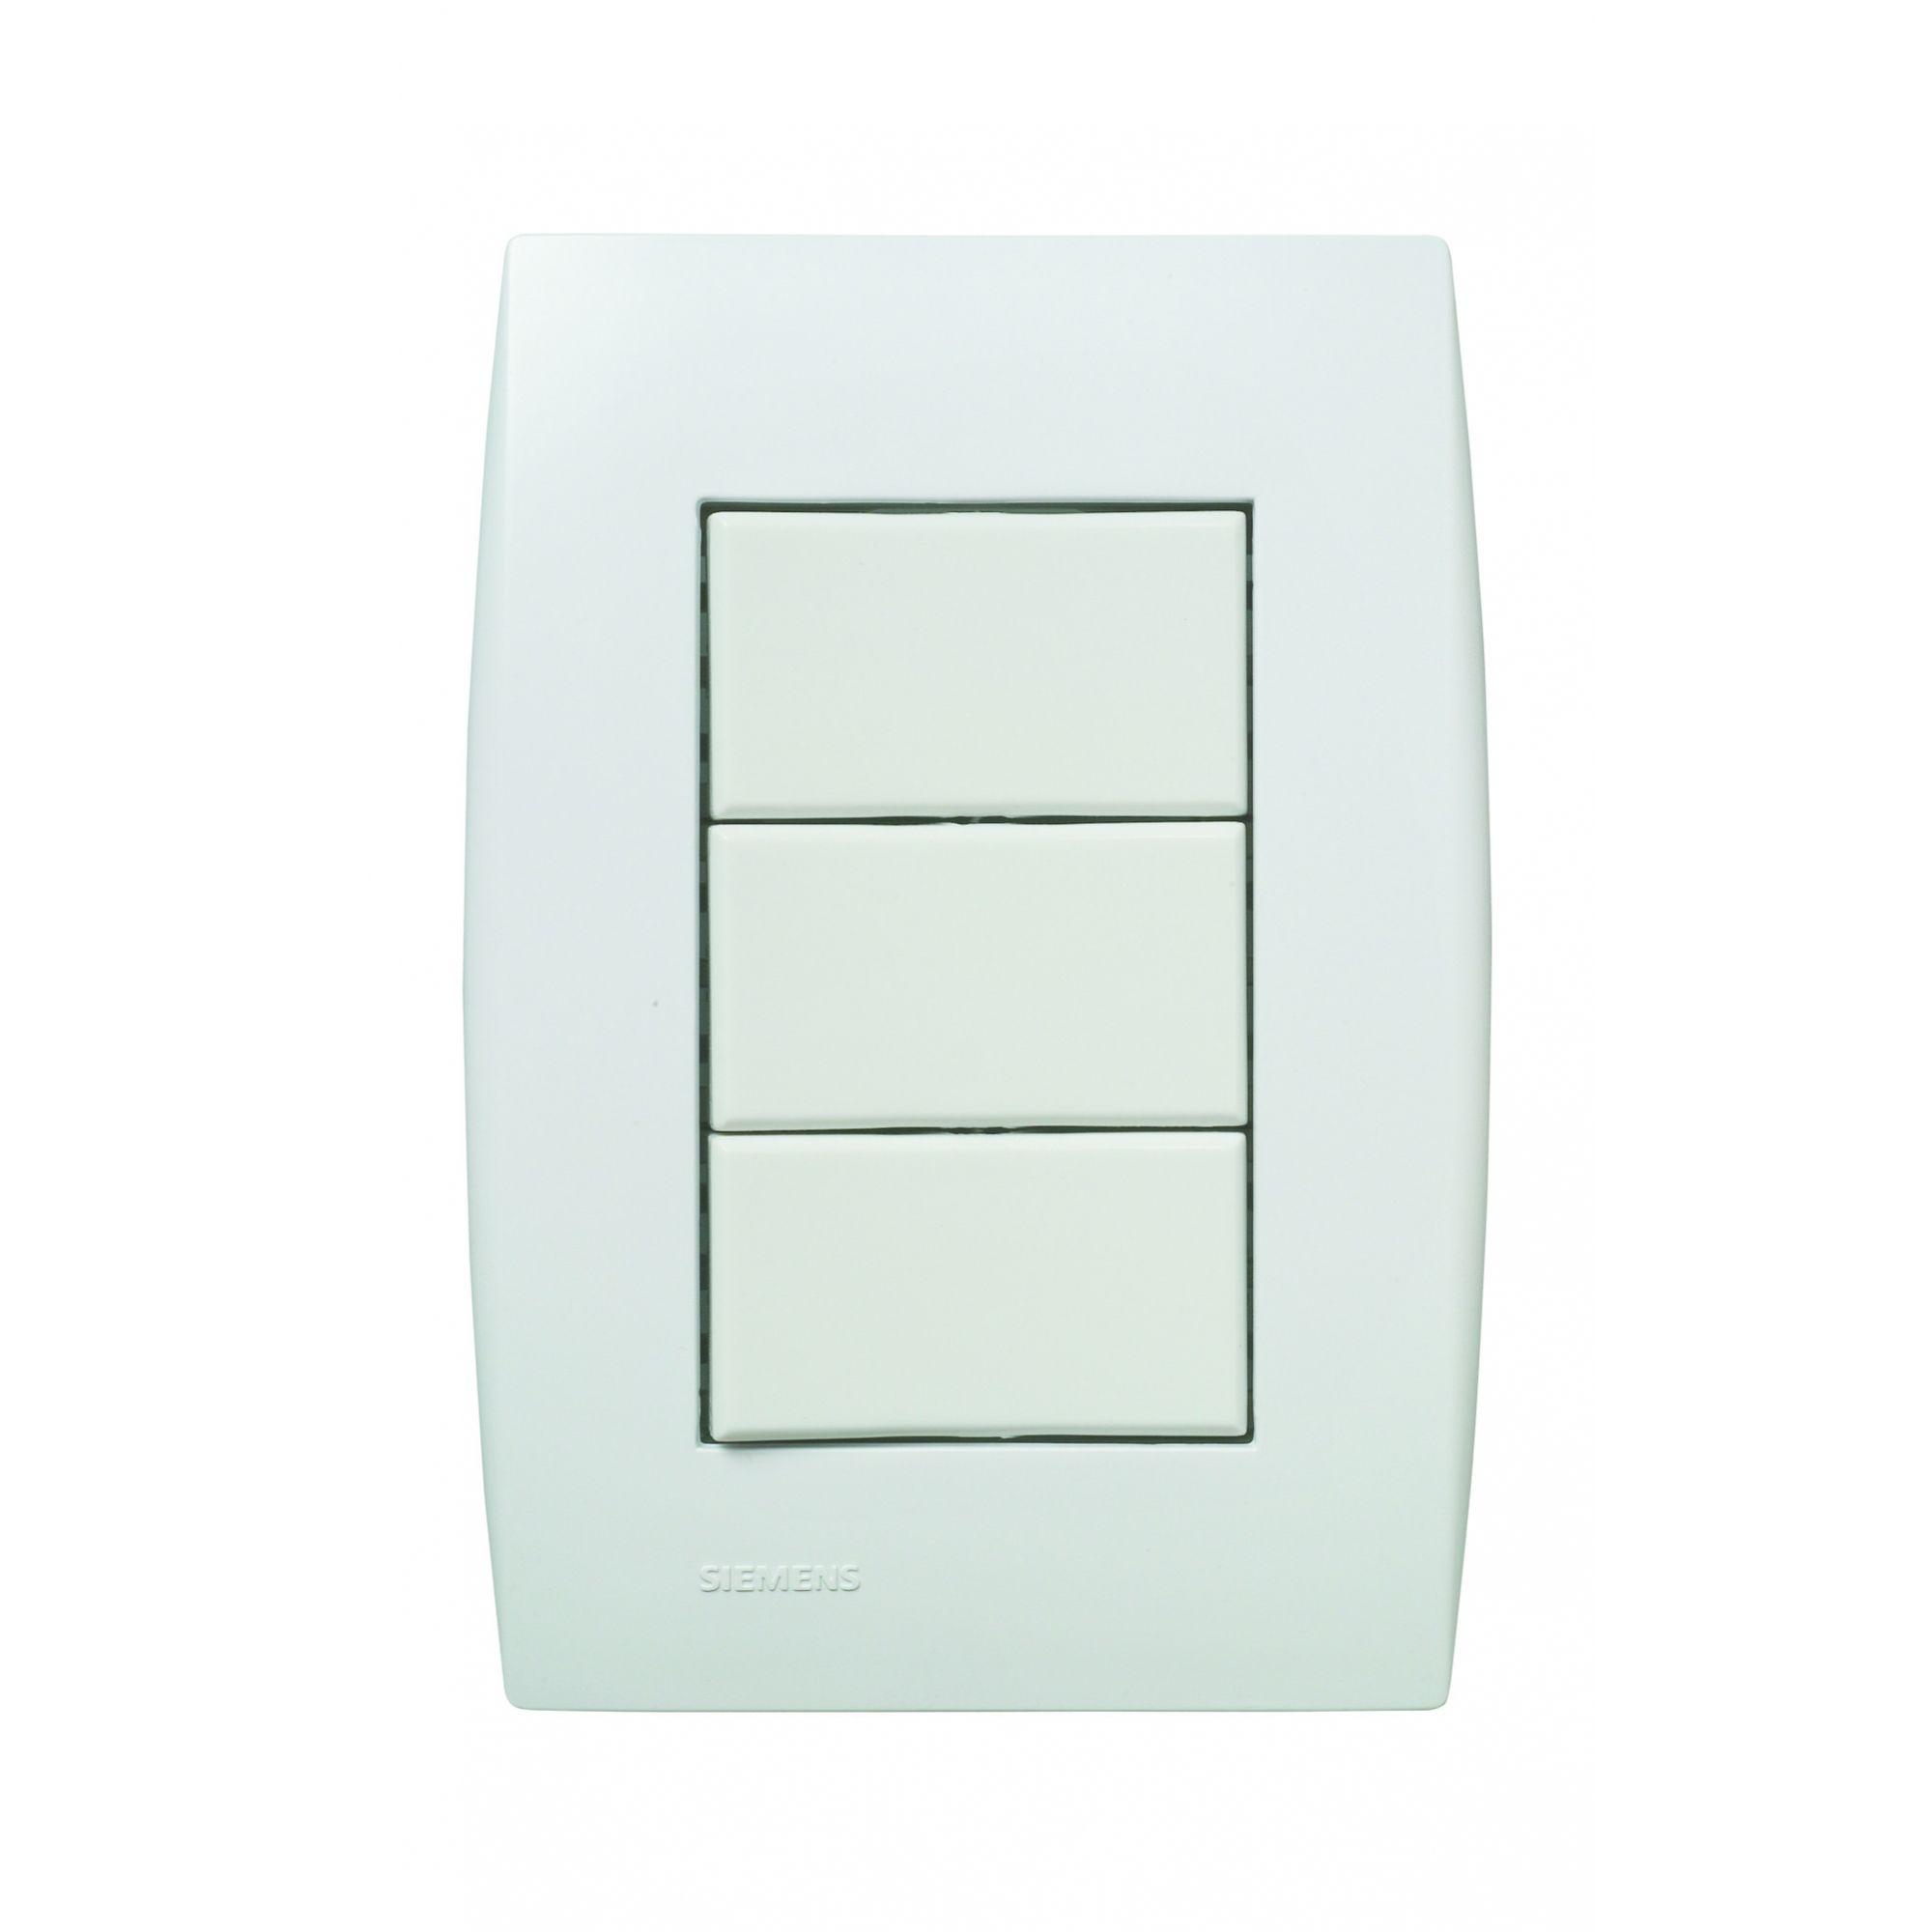 1 Interruptor Simples + 2 Interruptores Paralelos – Ilus 5TA9 9053 - Siemens